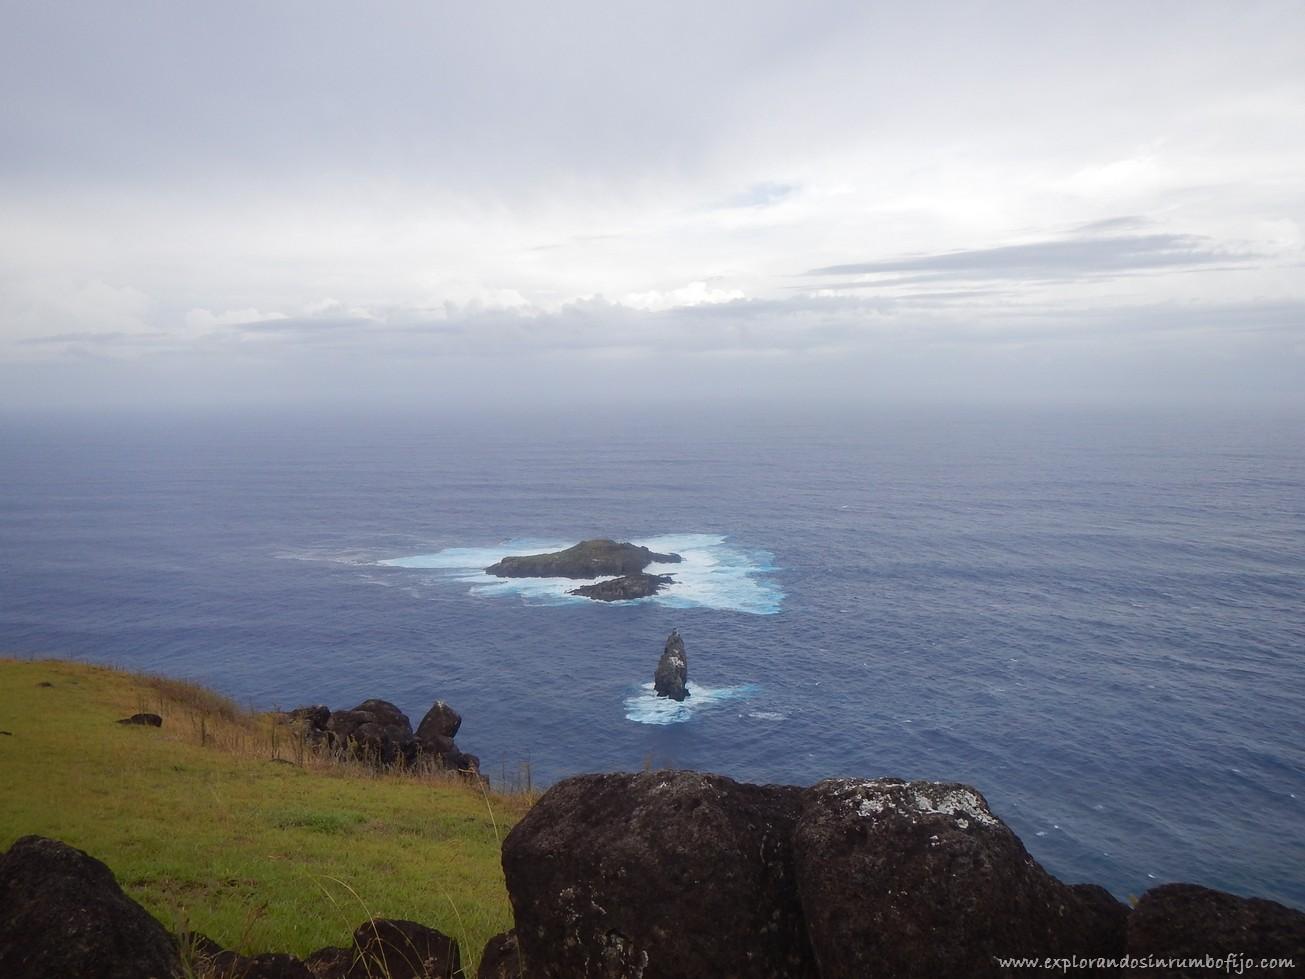 islotes Motu Nui, Motu Iti y Motu Kau Kau